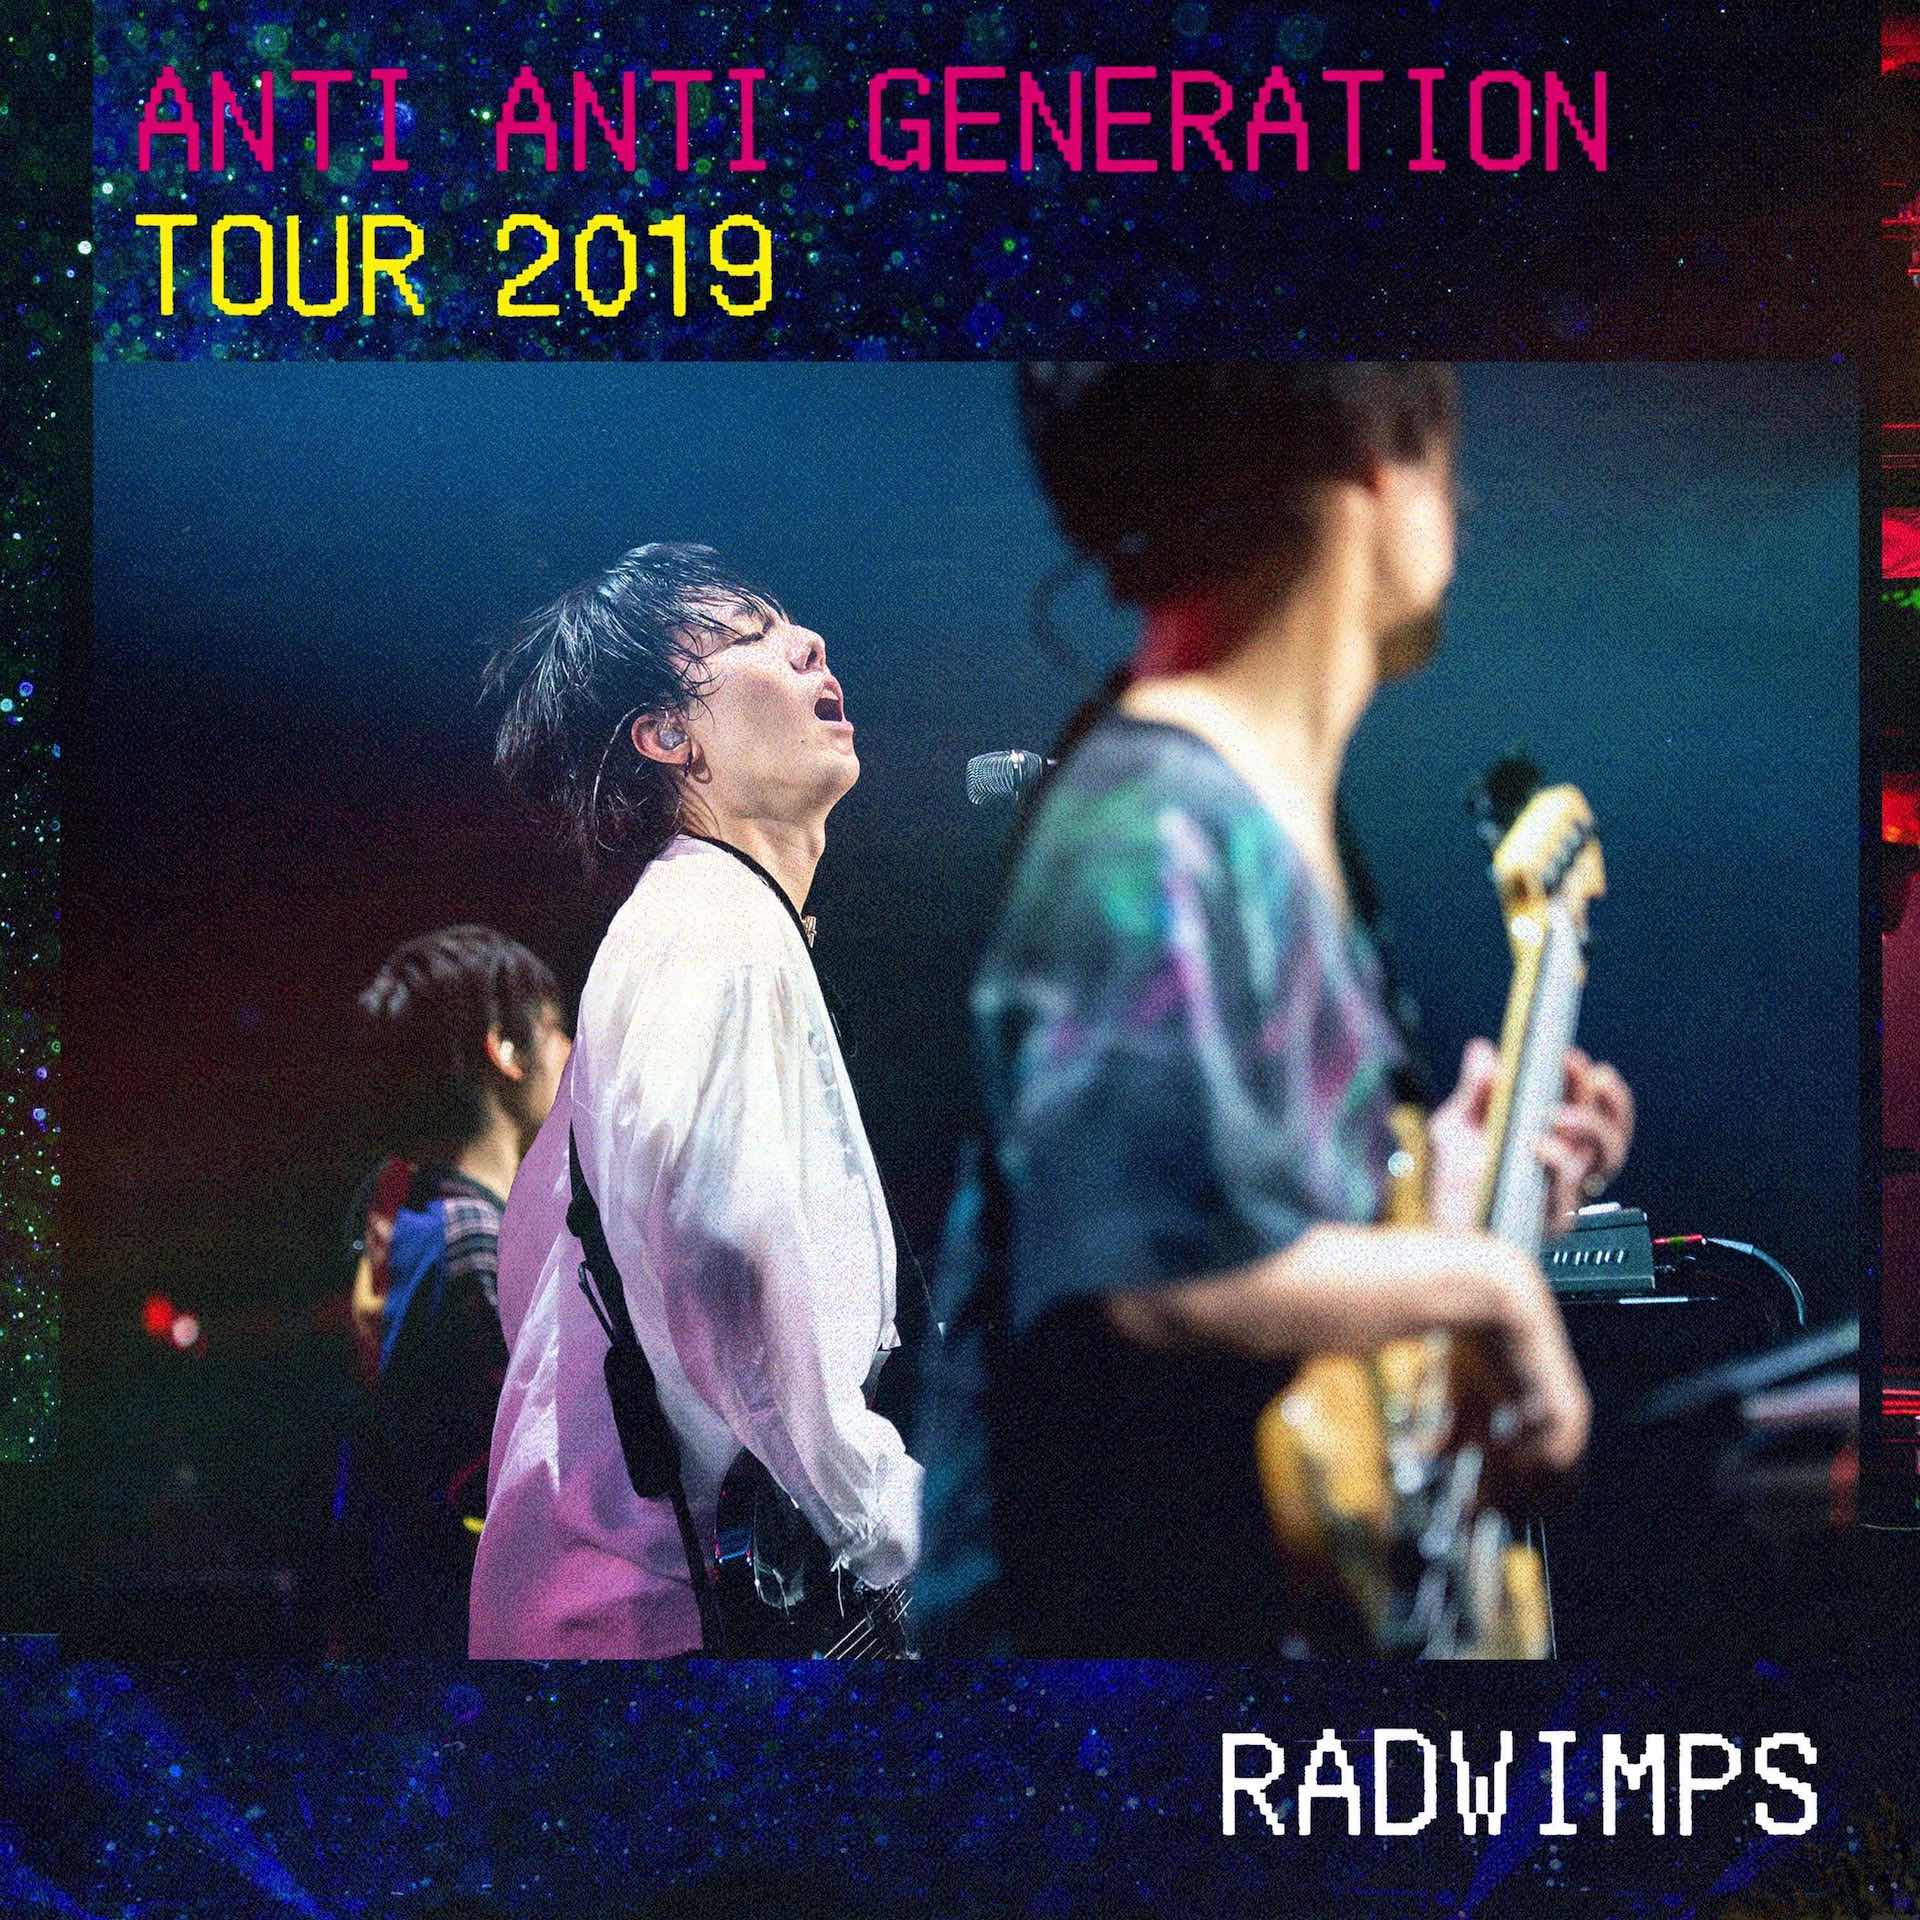 RADWIMPS、Apple Music限定で<ANTI ANTI GENERATION TOUR 2019>横浜アリーナ公演のライブ映像5曲分を配信!プレイリスト企画も始動 music200515_radwimps_main